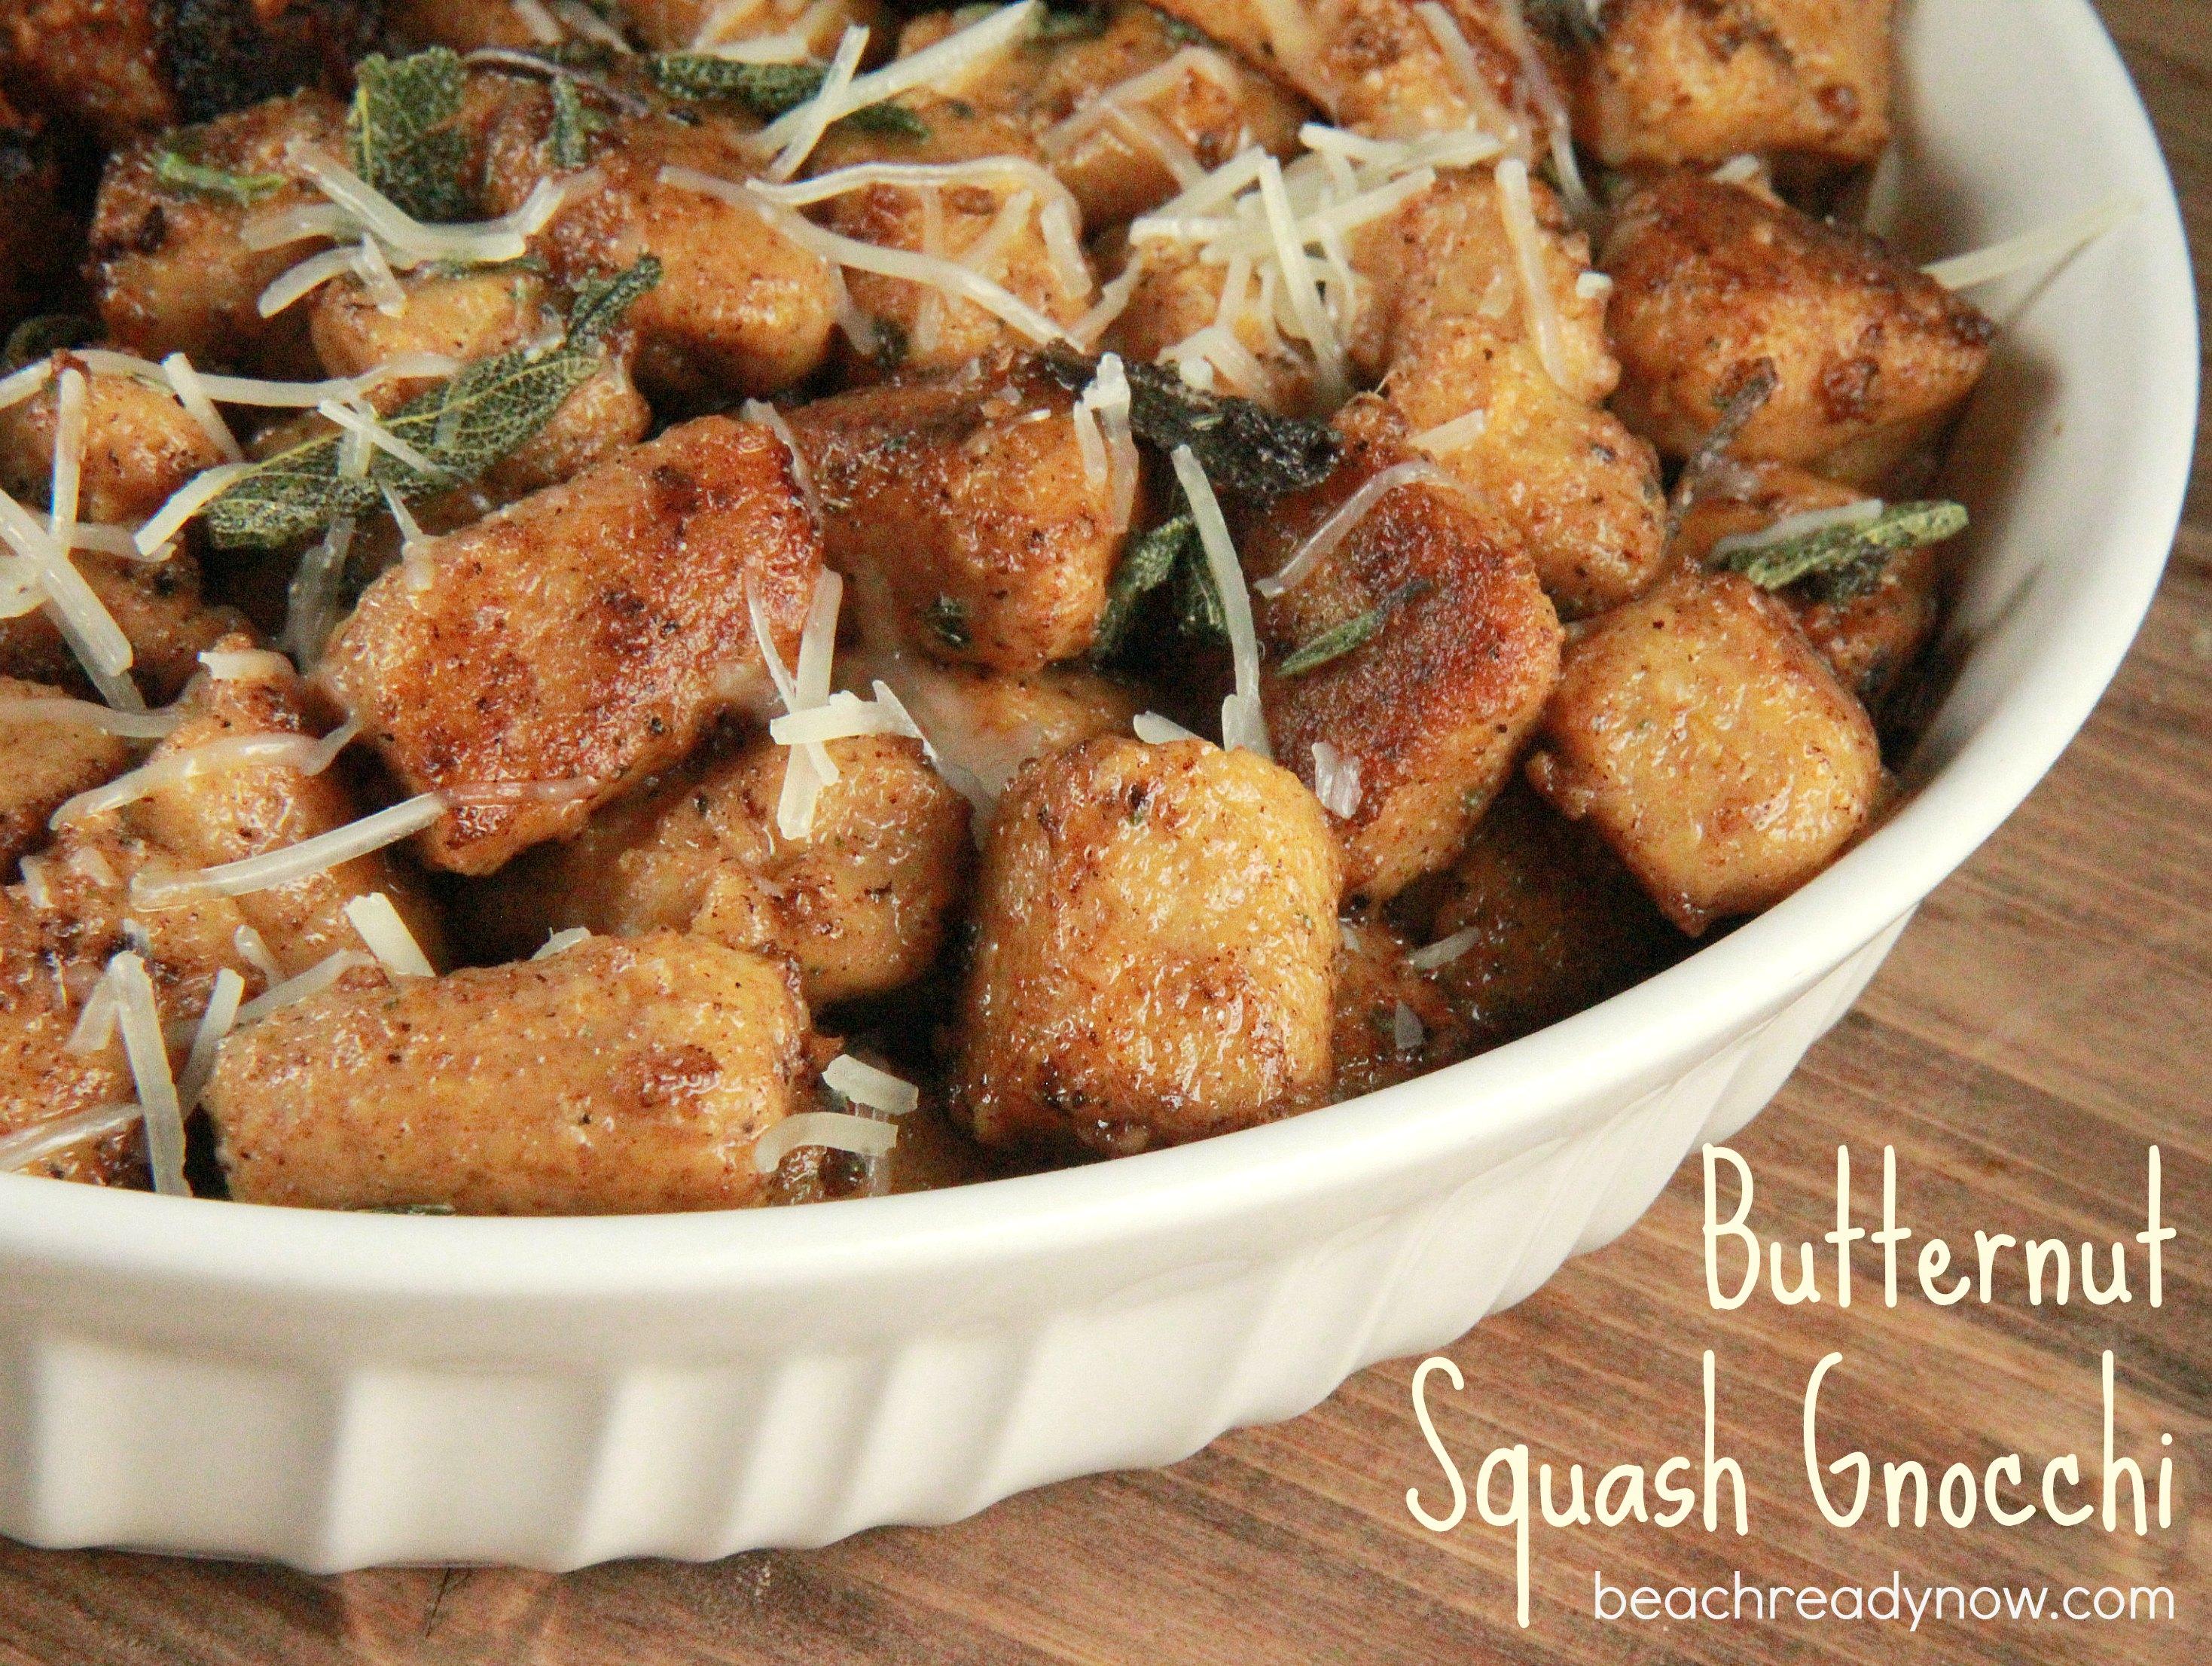 Butternut Squash Gnocchi with Sage